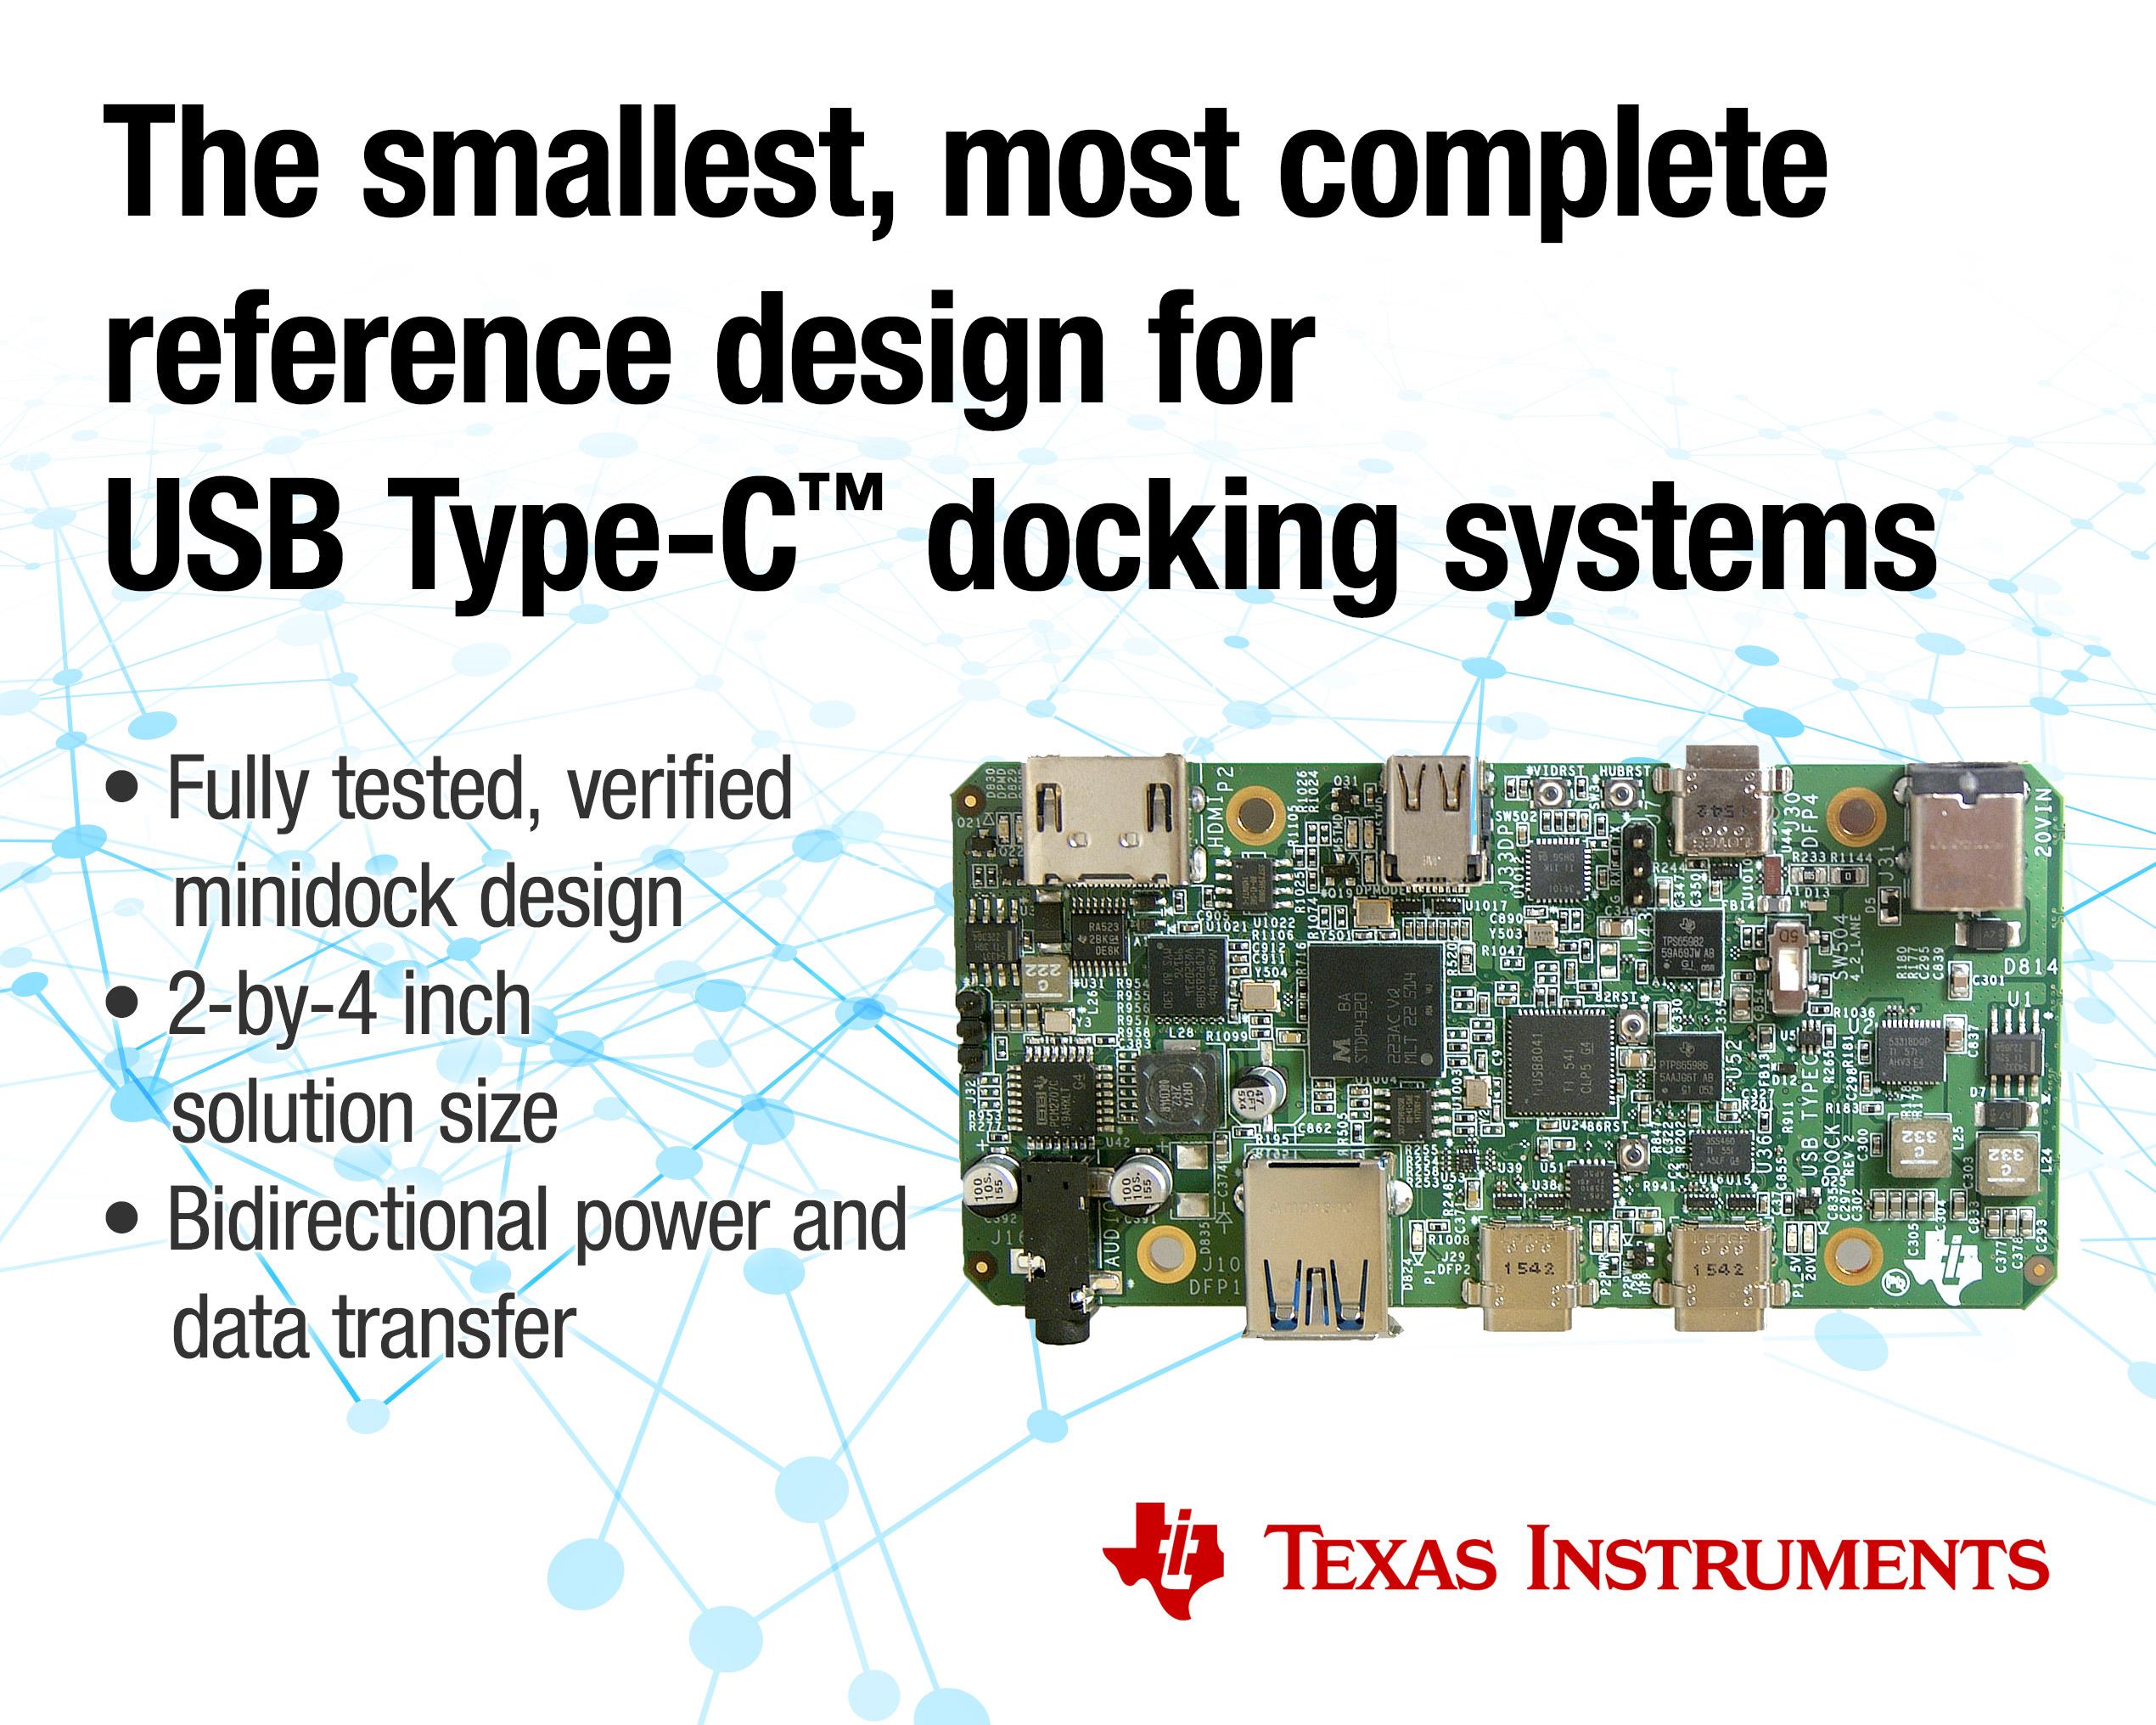 TI新型C™ 型USB对接系统设计可将方案尺寸减小一半